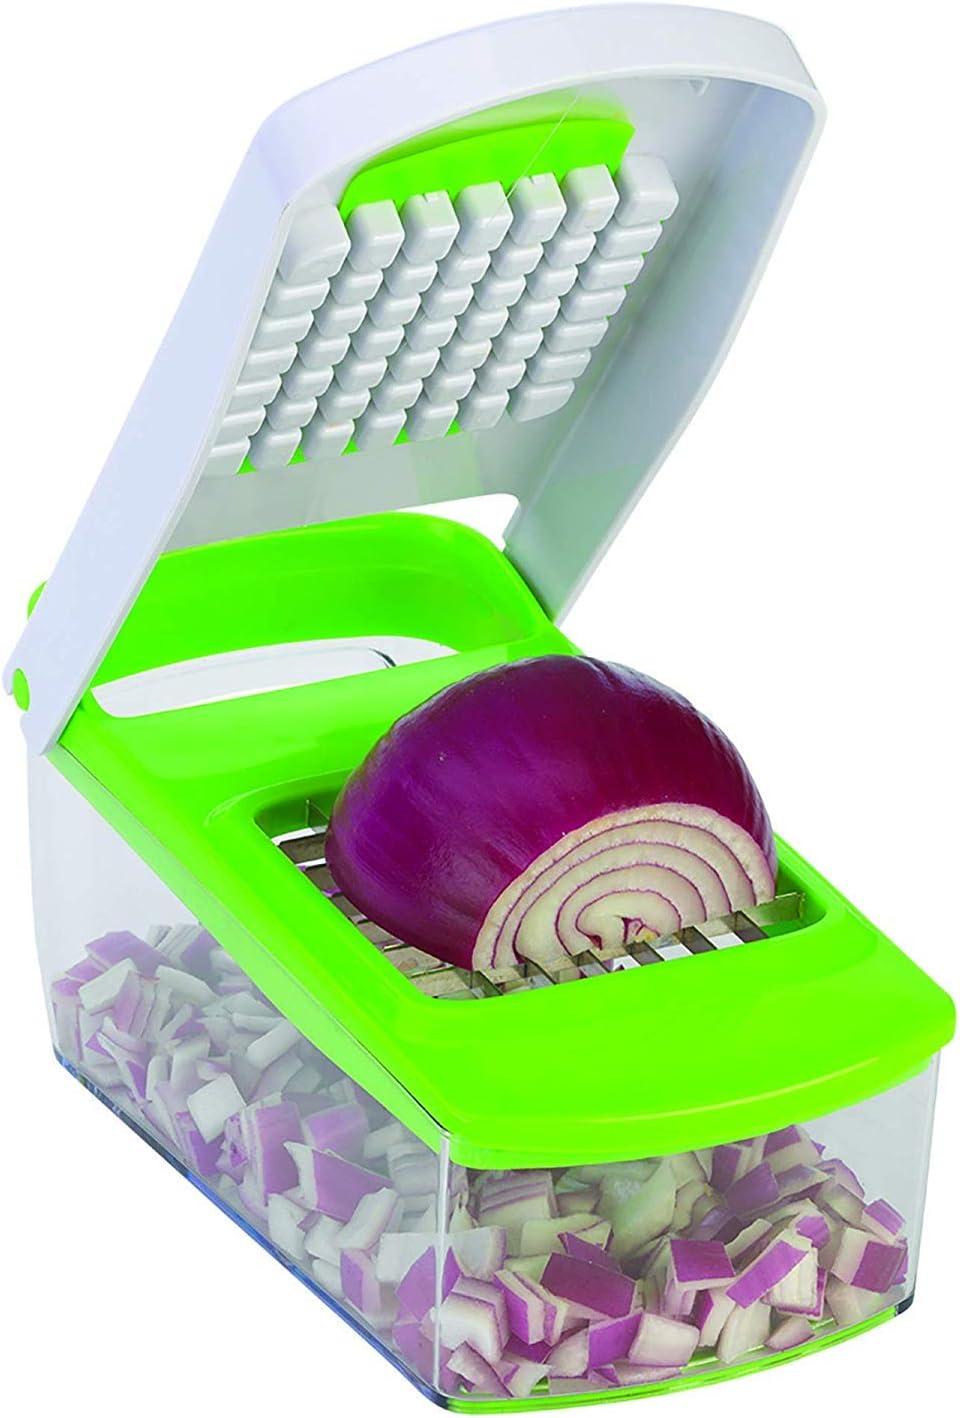 Good Cook 20712 Veggie Vegitable Chopper/Dicer, No Tear Onion chopping, Heavy Duty BPA Free Multi Vegetable-Fruit-Cheese-Onion Chopper-Dicer-Kitchen Cutter